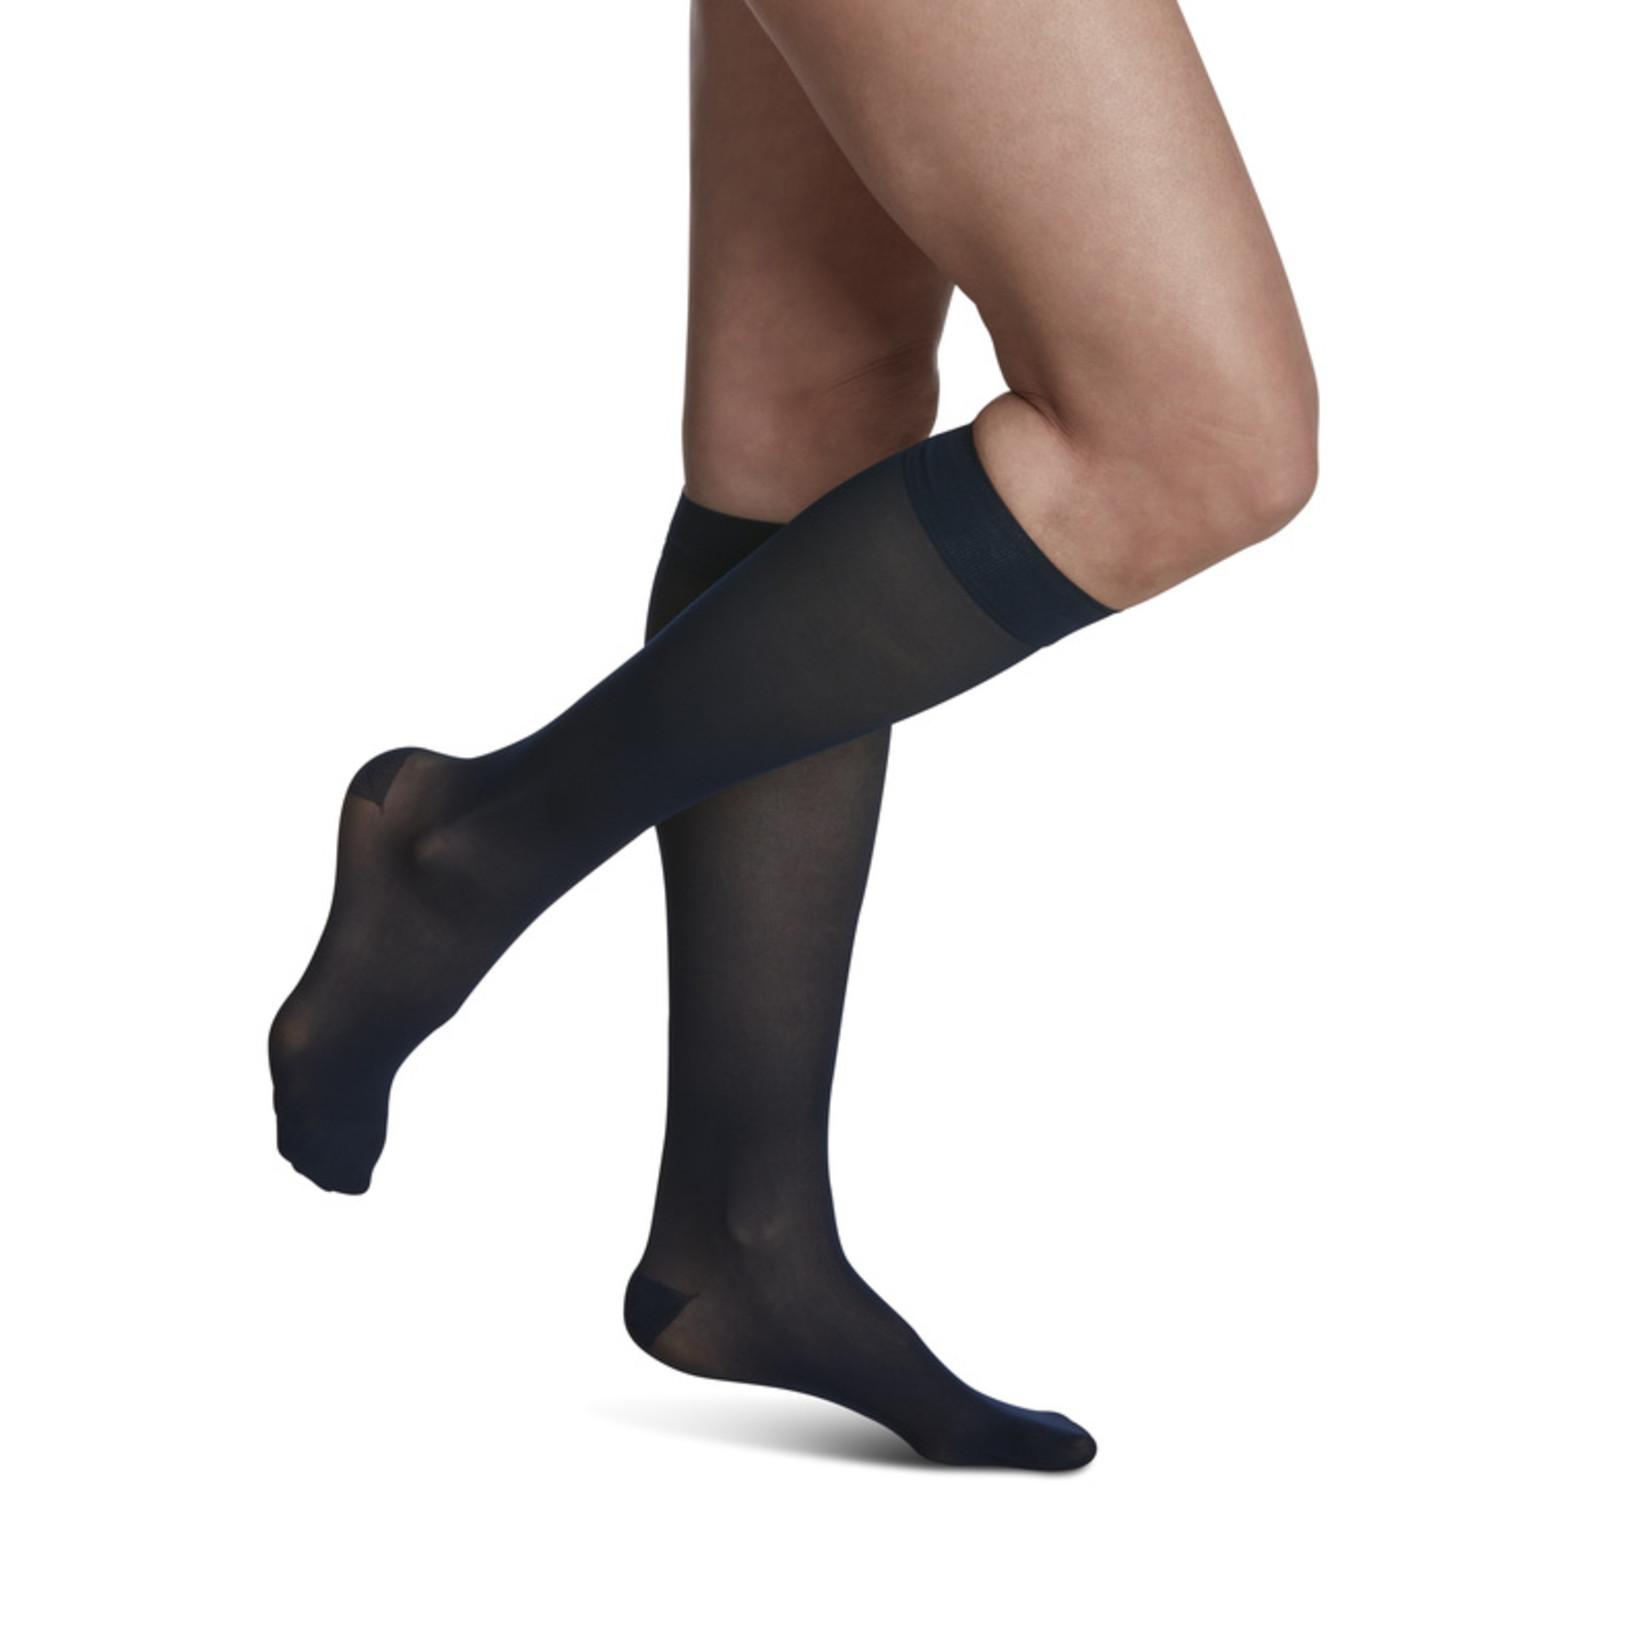 SIGVARIS Women's Style Sheer Calf 15-20mmHg